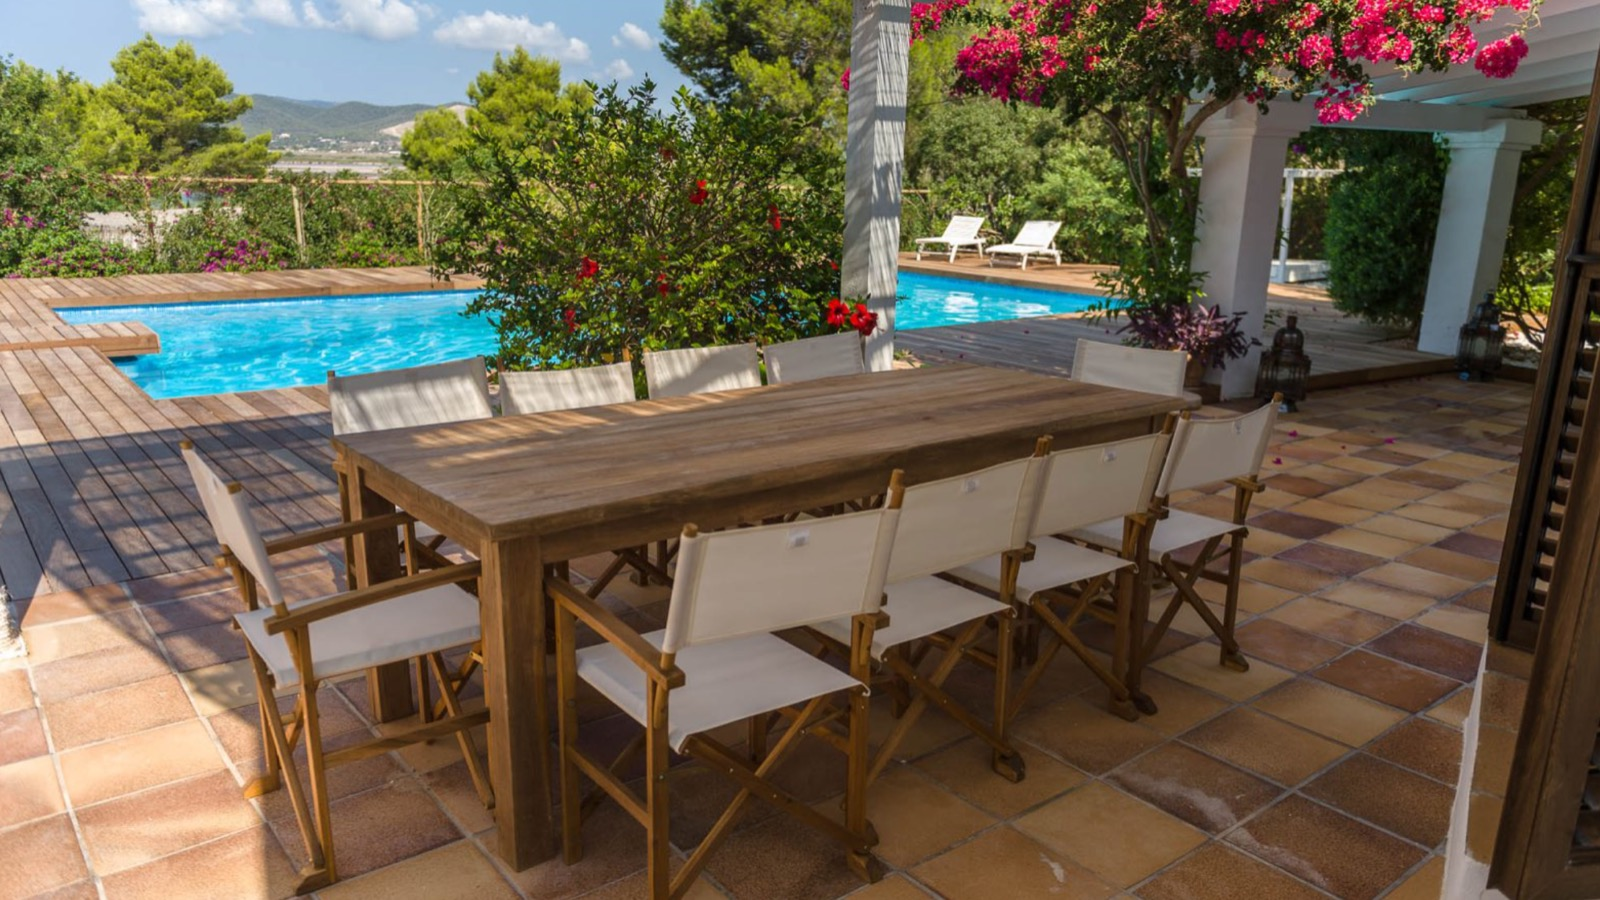 425 villa la salinas iangella ex nuriadcc86fd7-015c-4773-8785-80e8b2b0544d